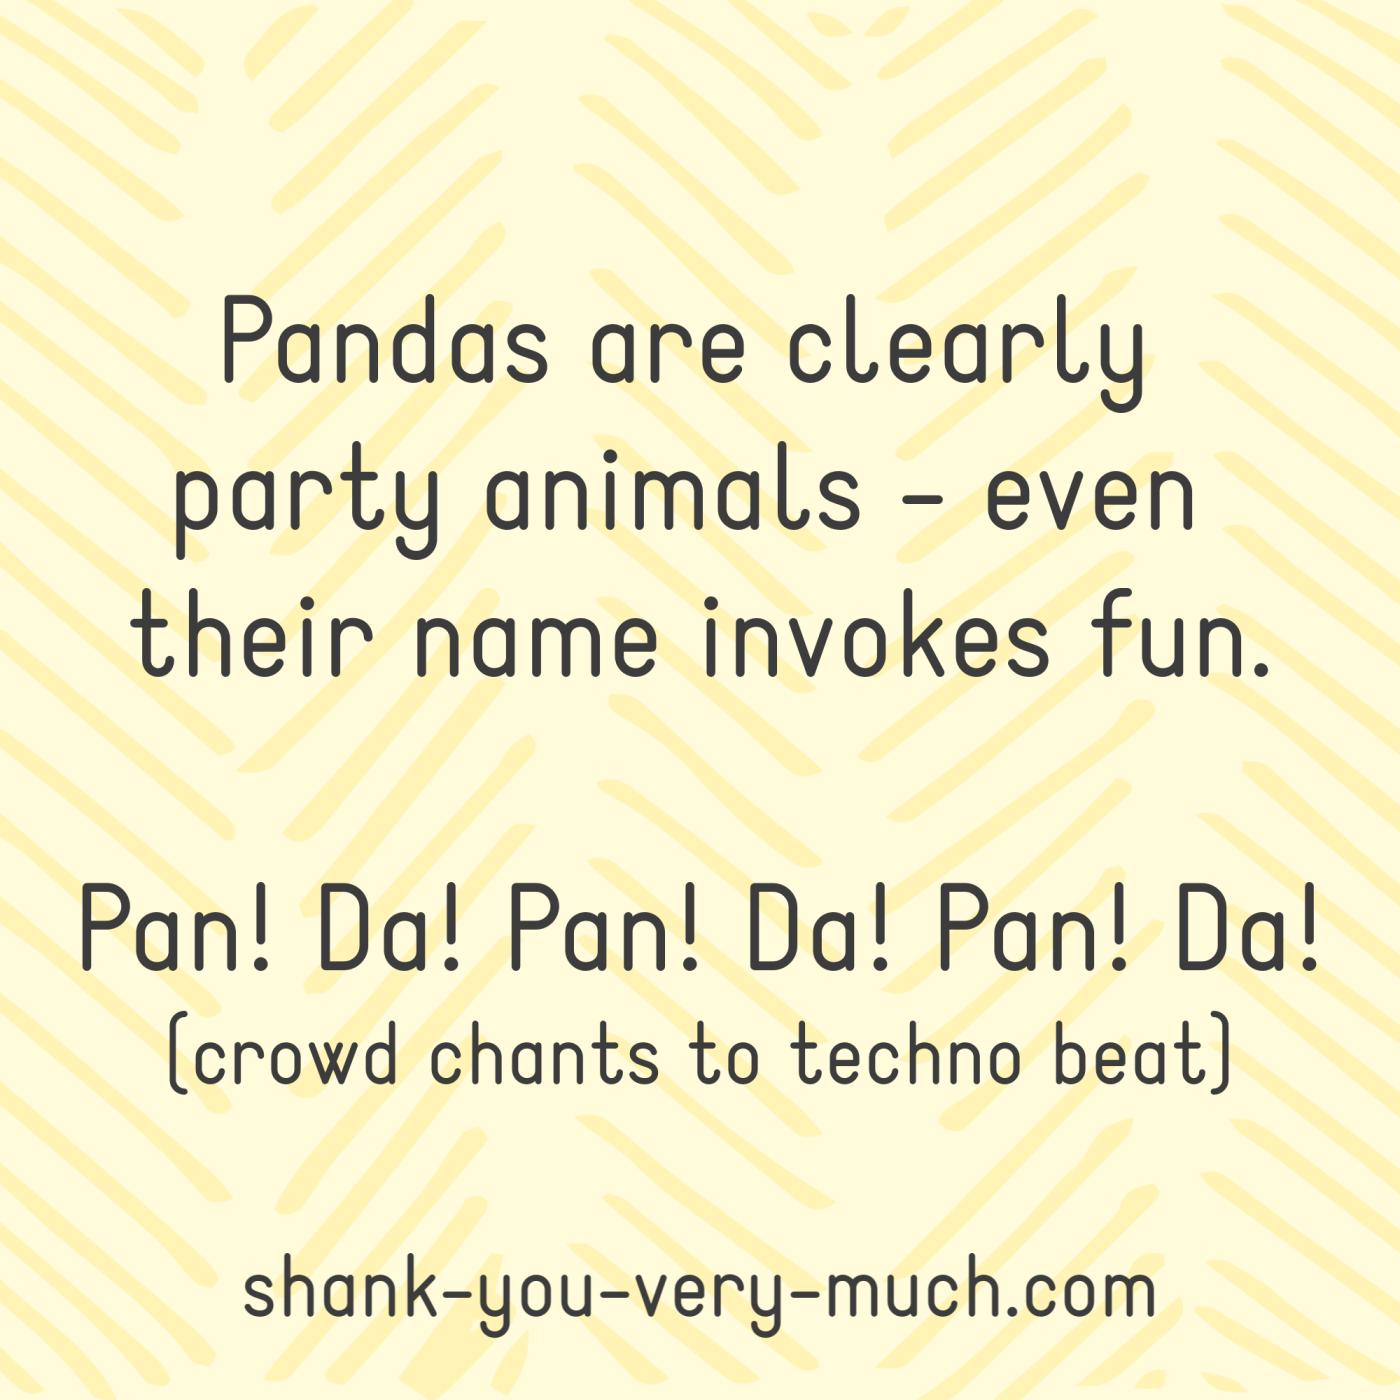 Pandas are clearly party animals - even their name invokes fun. Pan! Da! Pan! Da! Pan! Da! (crowd chants to techno beat)